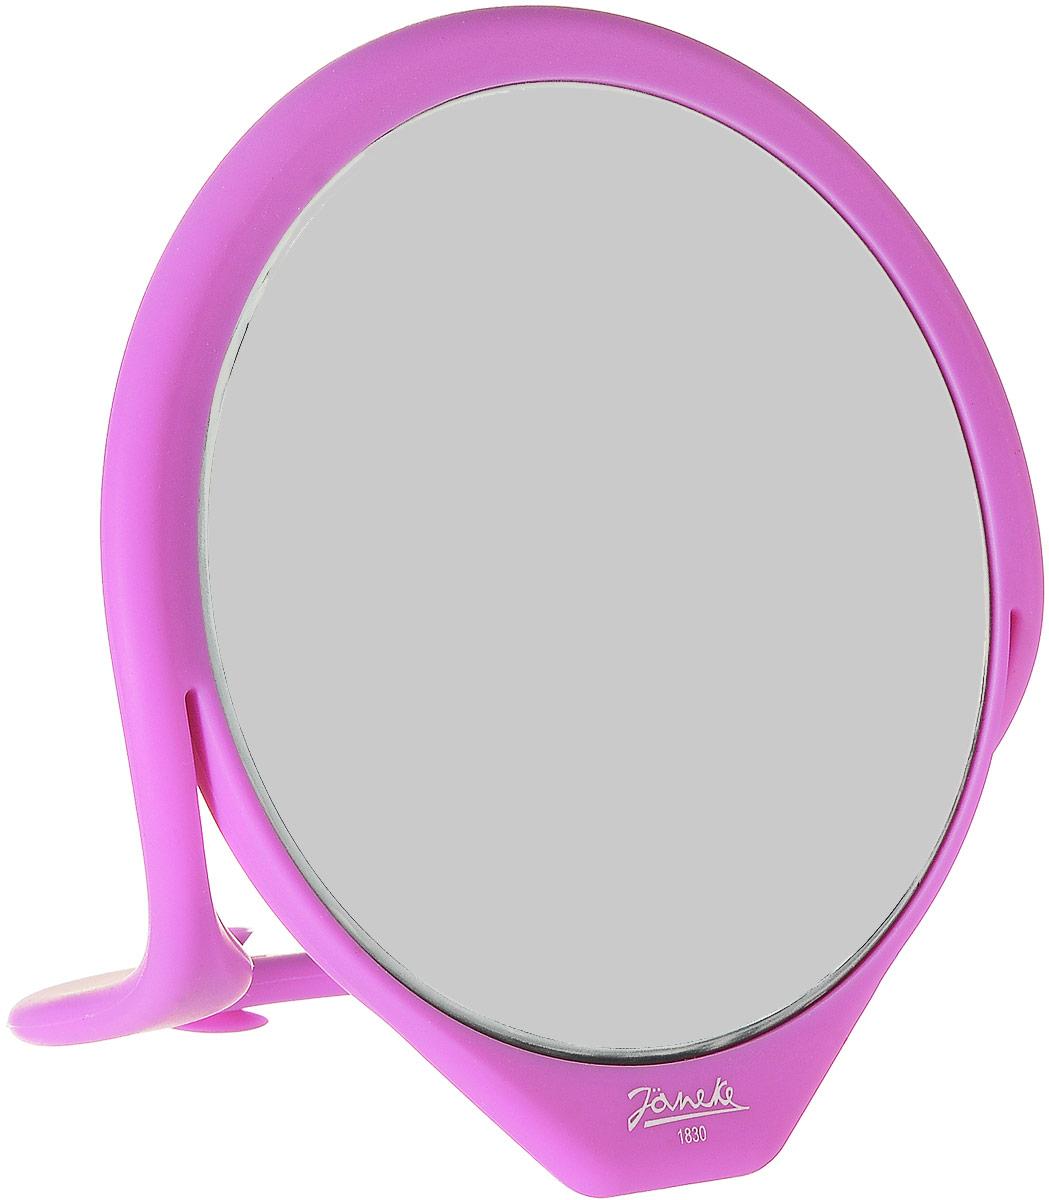 Janeke Зеркало настольное, 10445 RSA 808609